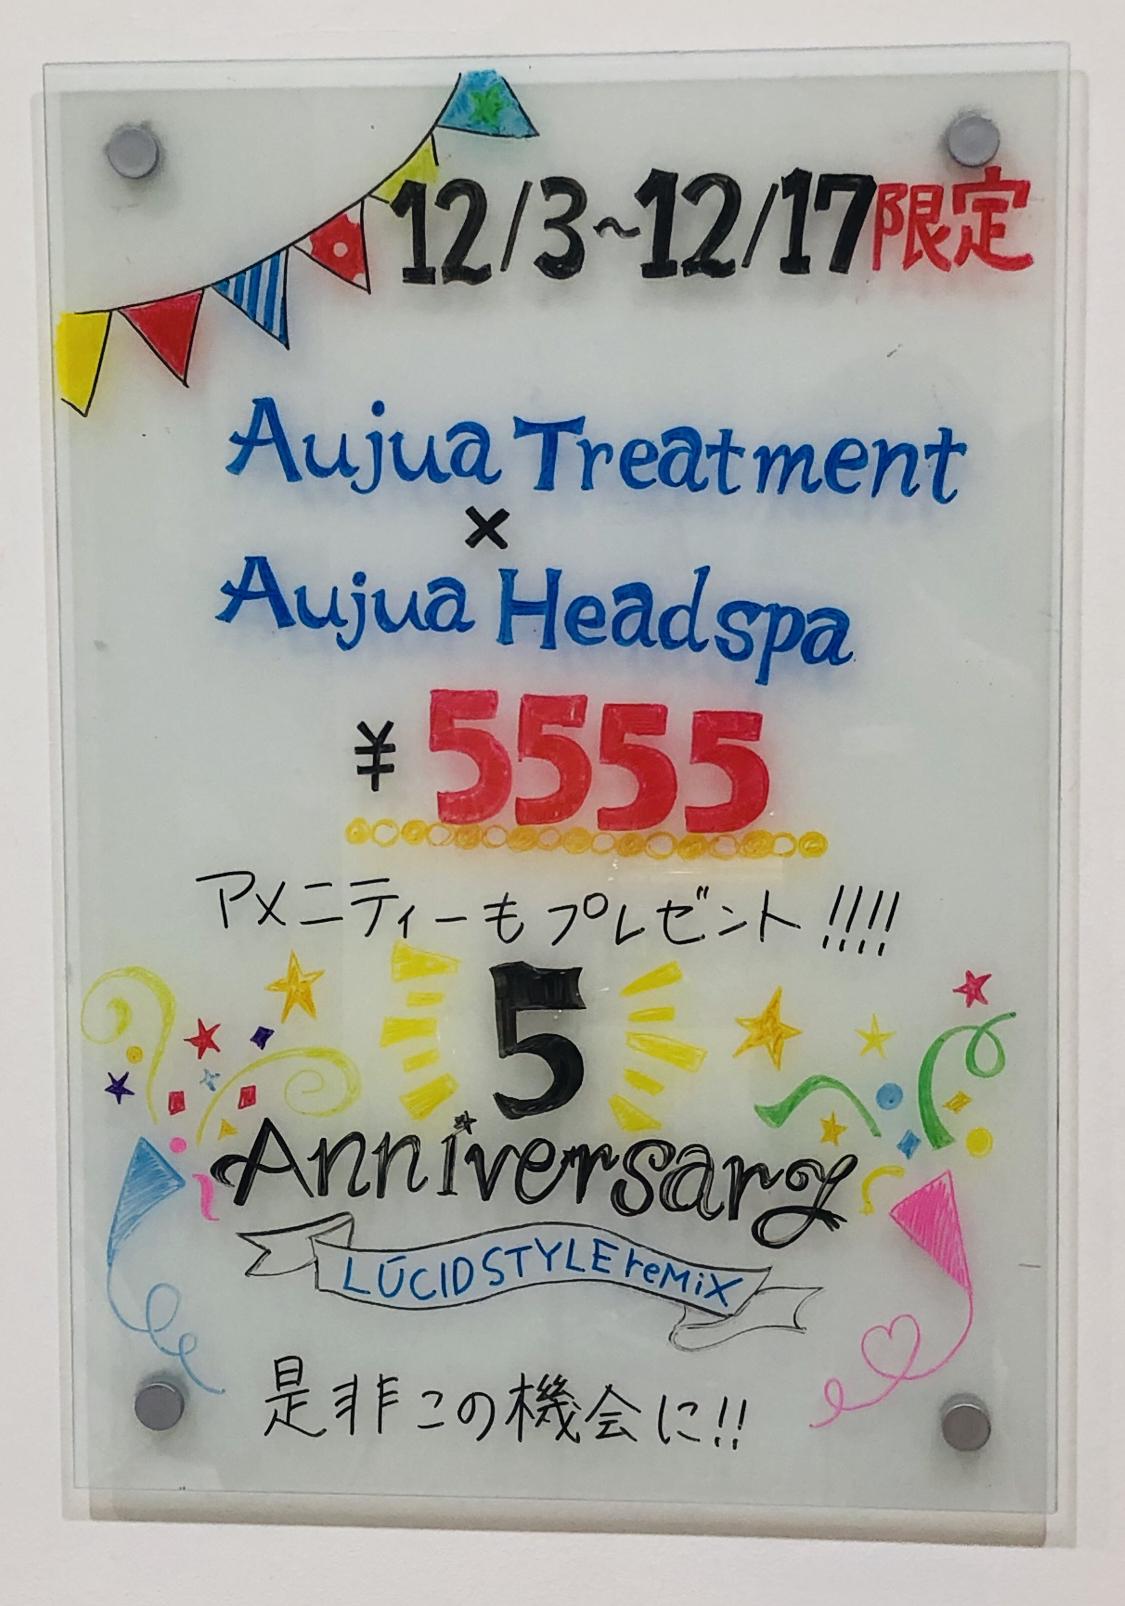 5th anniversary‼︎